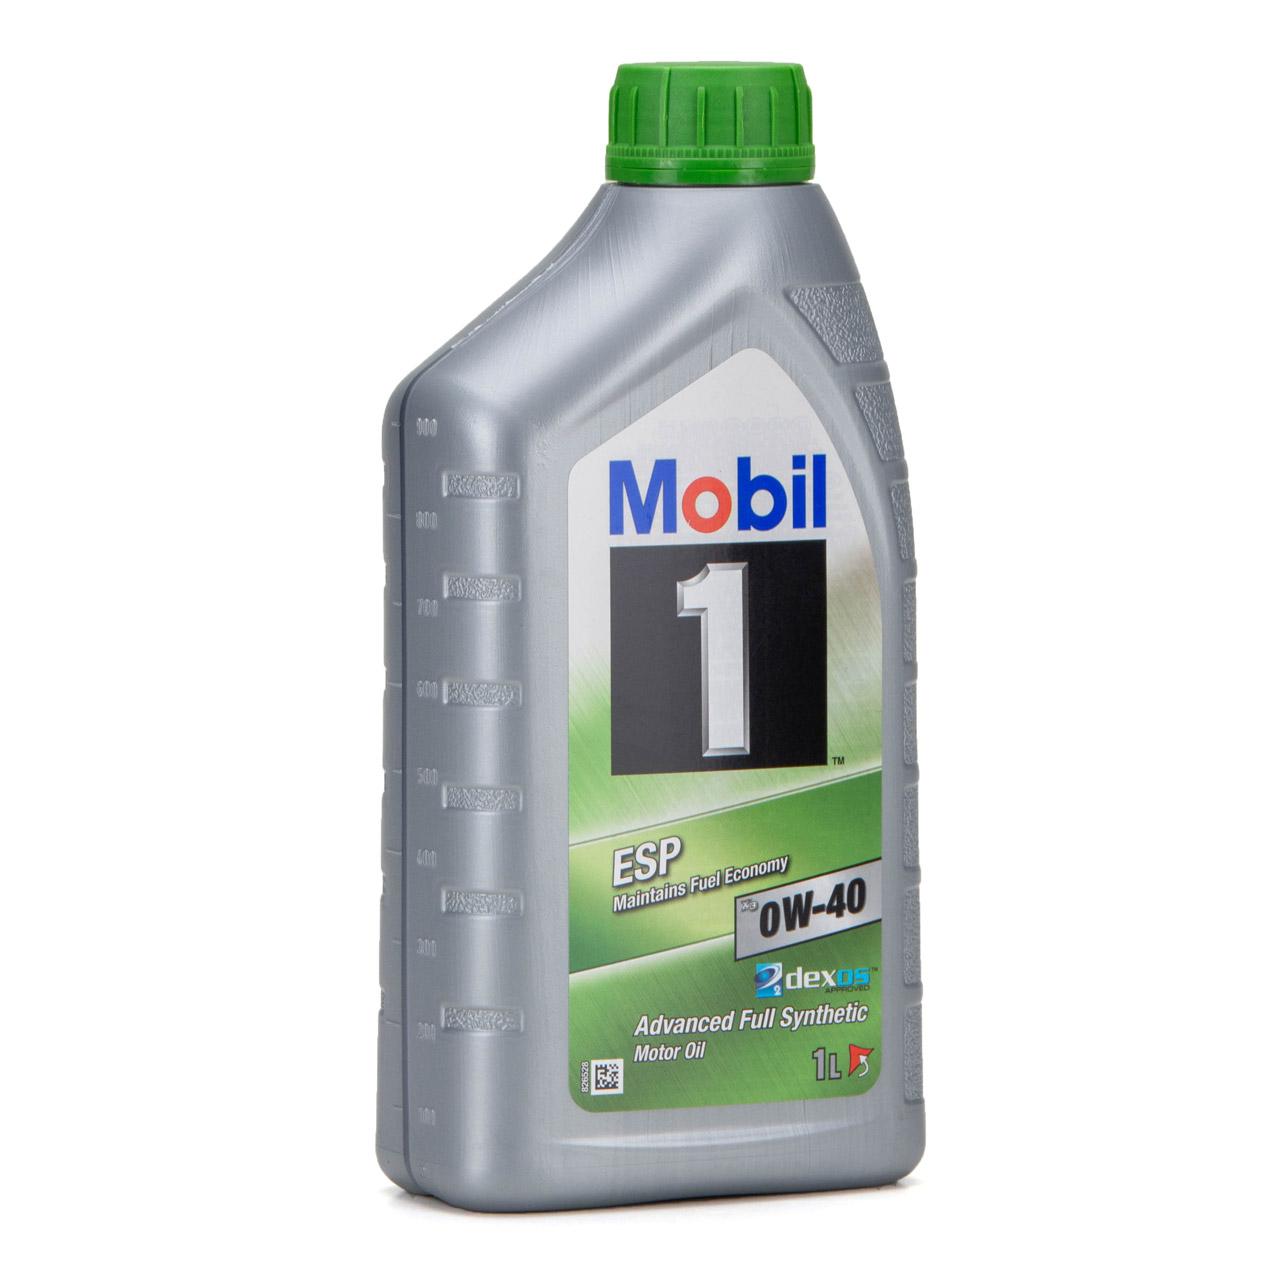 Mobil 1 ESP X3 C40 Motoröl Öl 0W-40 0W40 dexos2 PORSCHE C40 VW 511.00 - 6 Liter